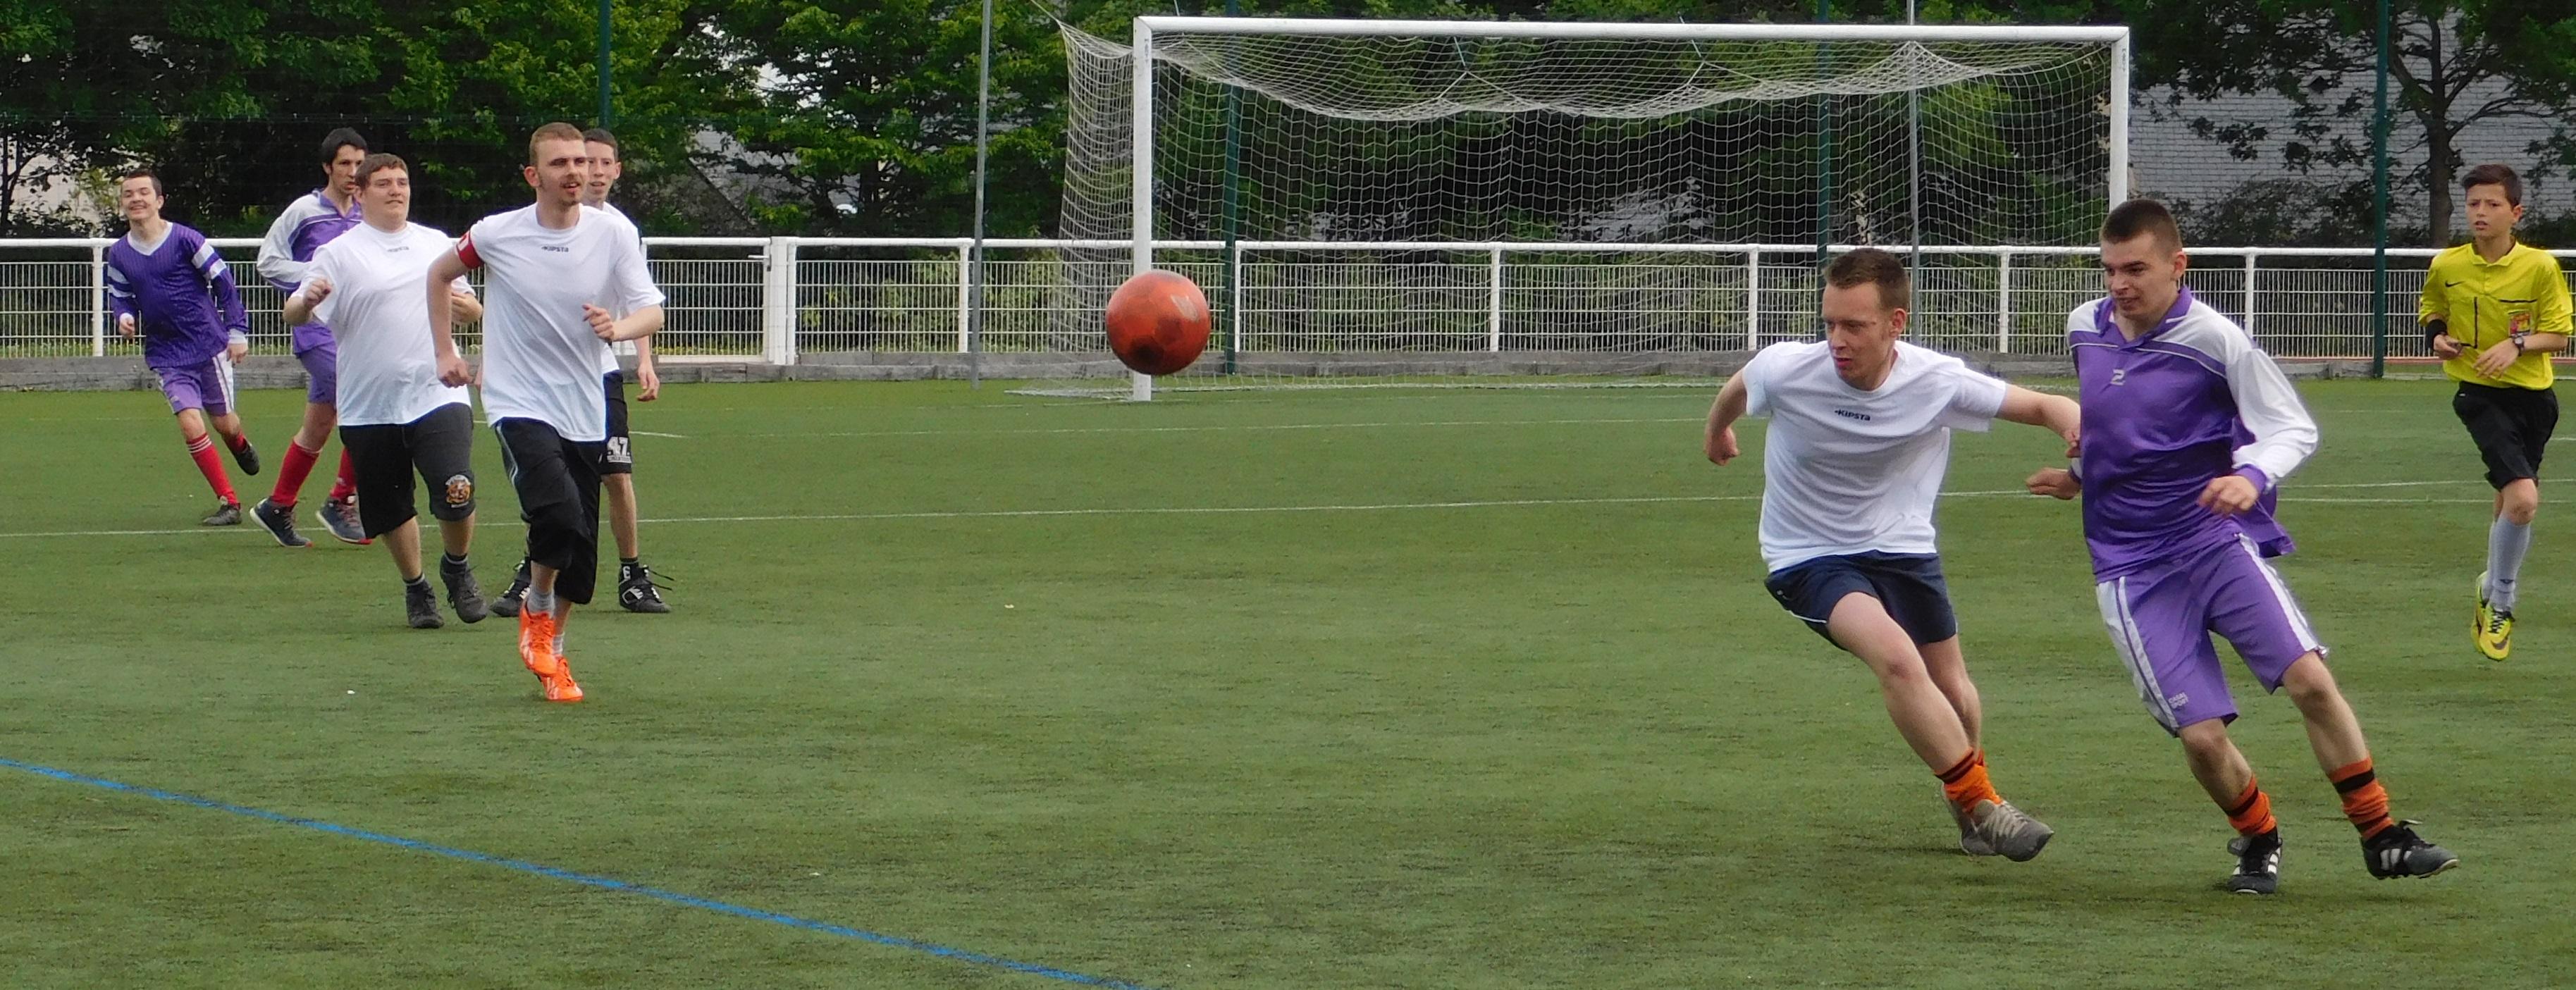 Manifestation. Challenge Jeunes Footballeurs sport adapté ce mercredi